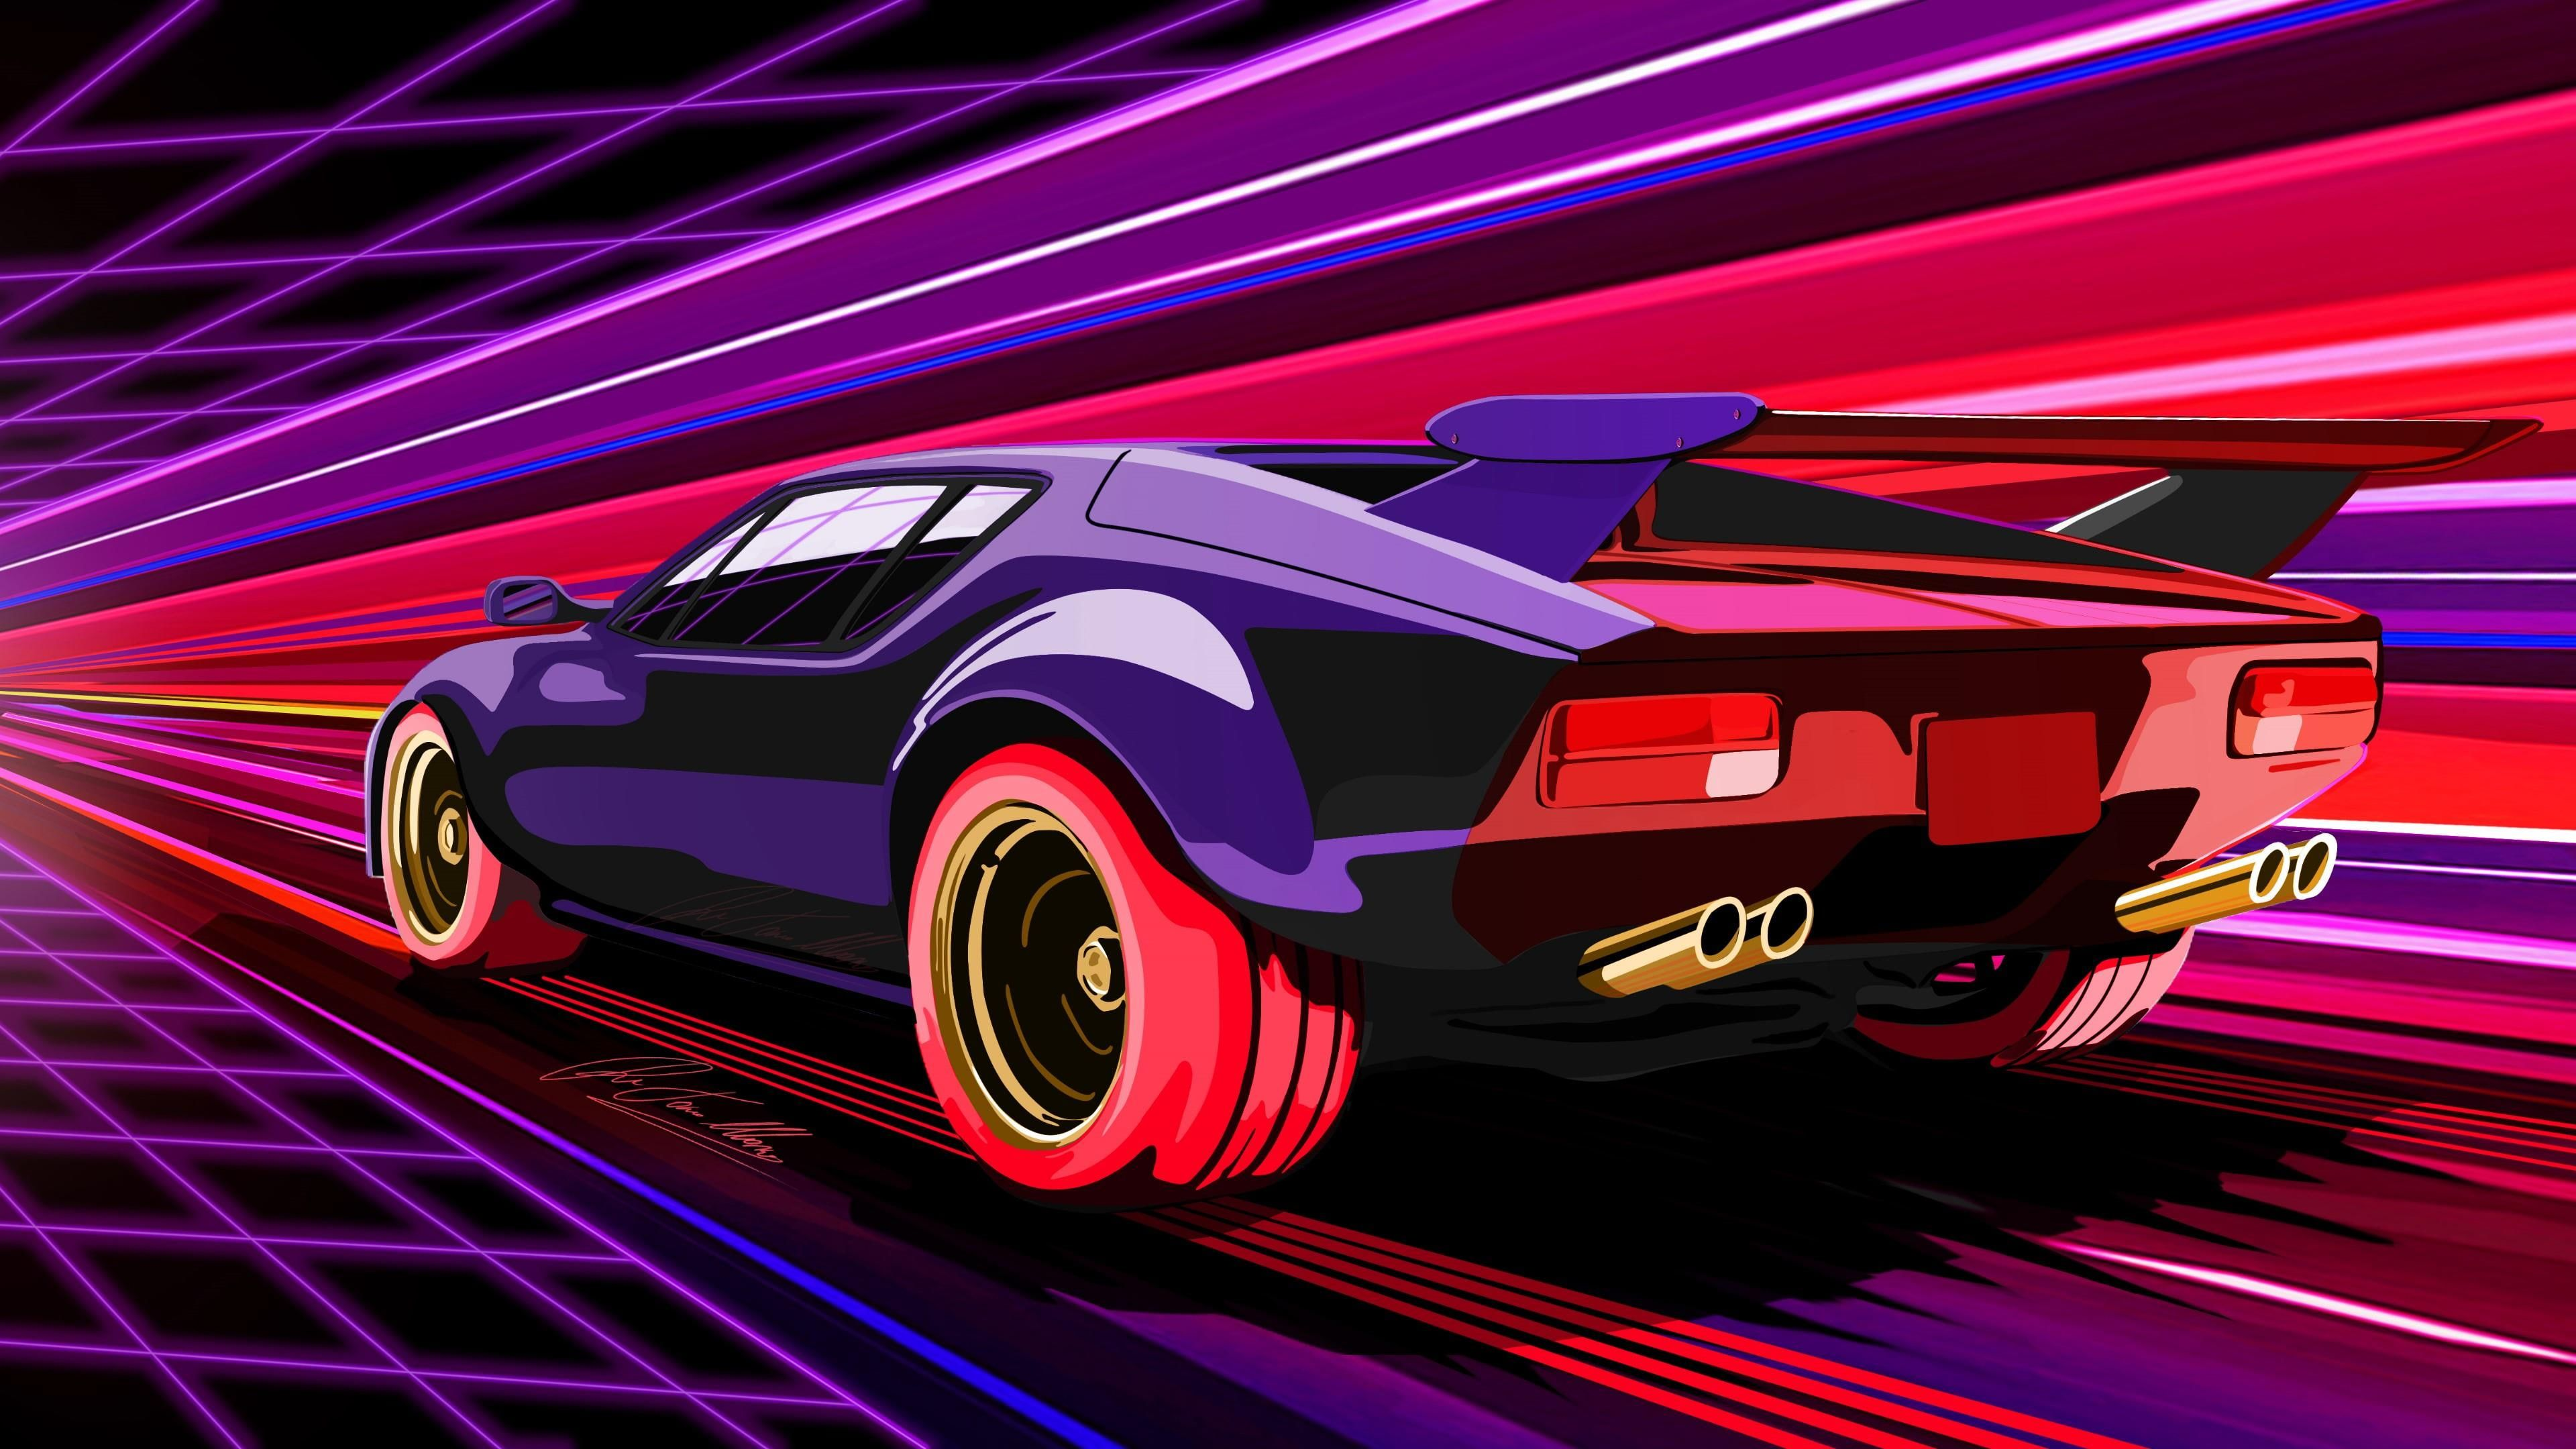 Retrowave Car Vehicle Sports Car Synthwave 80s 1980s Performance Car Race Car Graphics Neon Light Concept Car Ne Car Artwork Pantera Car Car Wallpapers